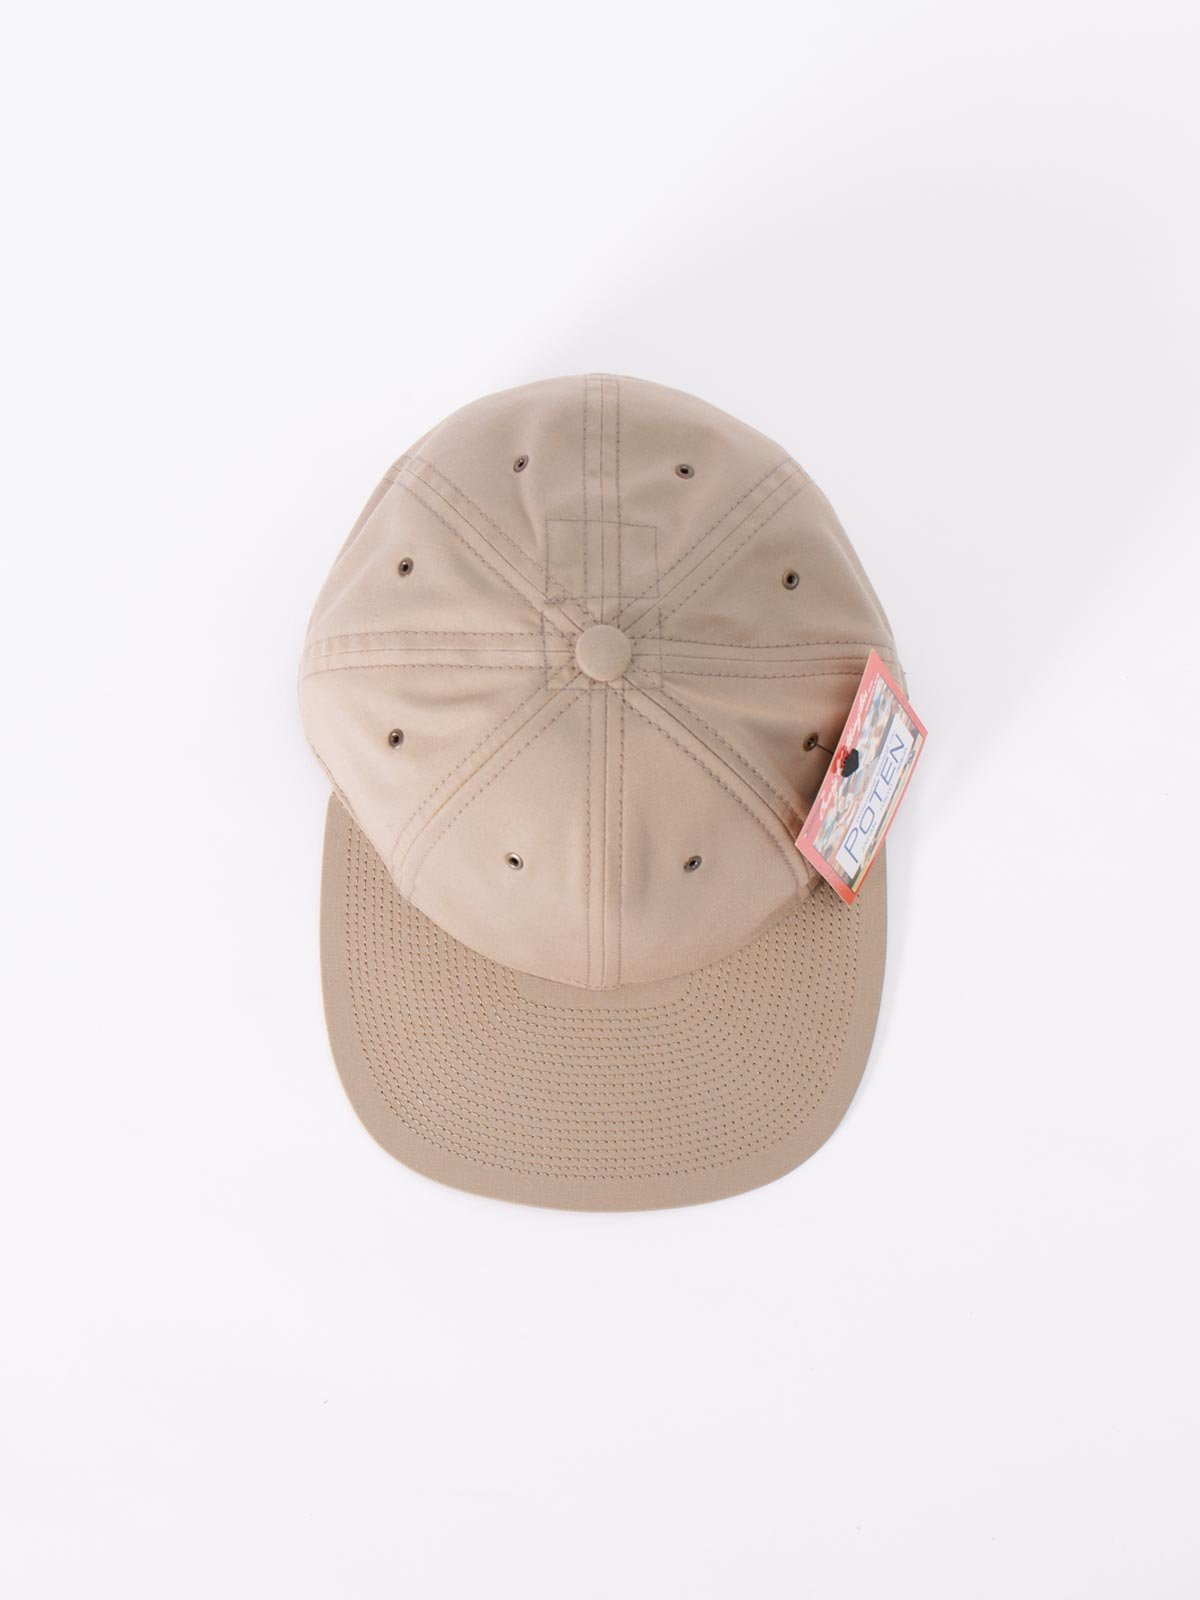 BEIGE COTTON CAP - Image 3